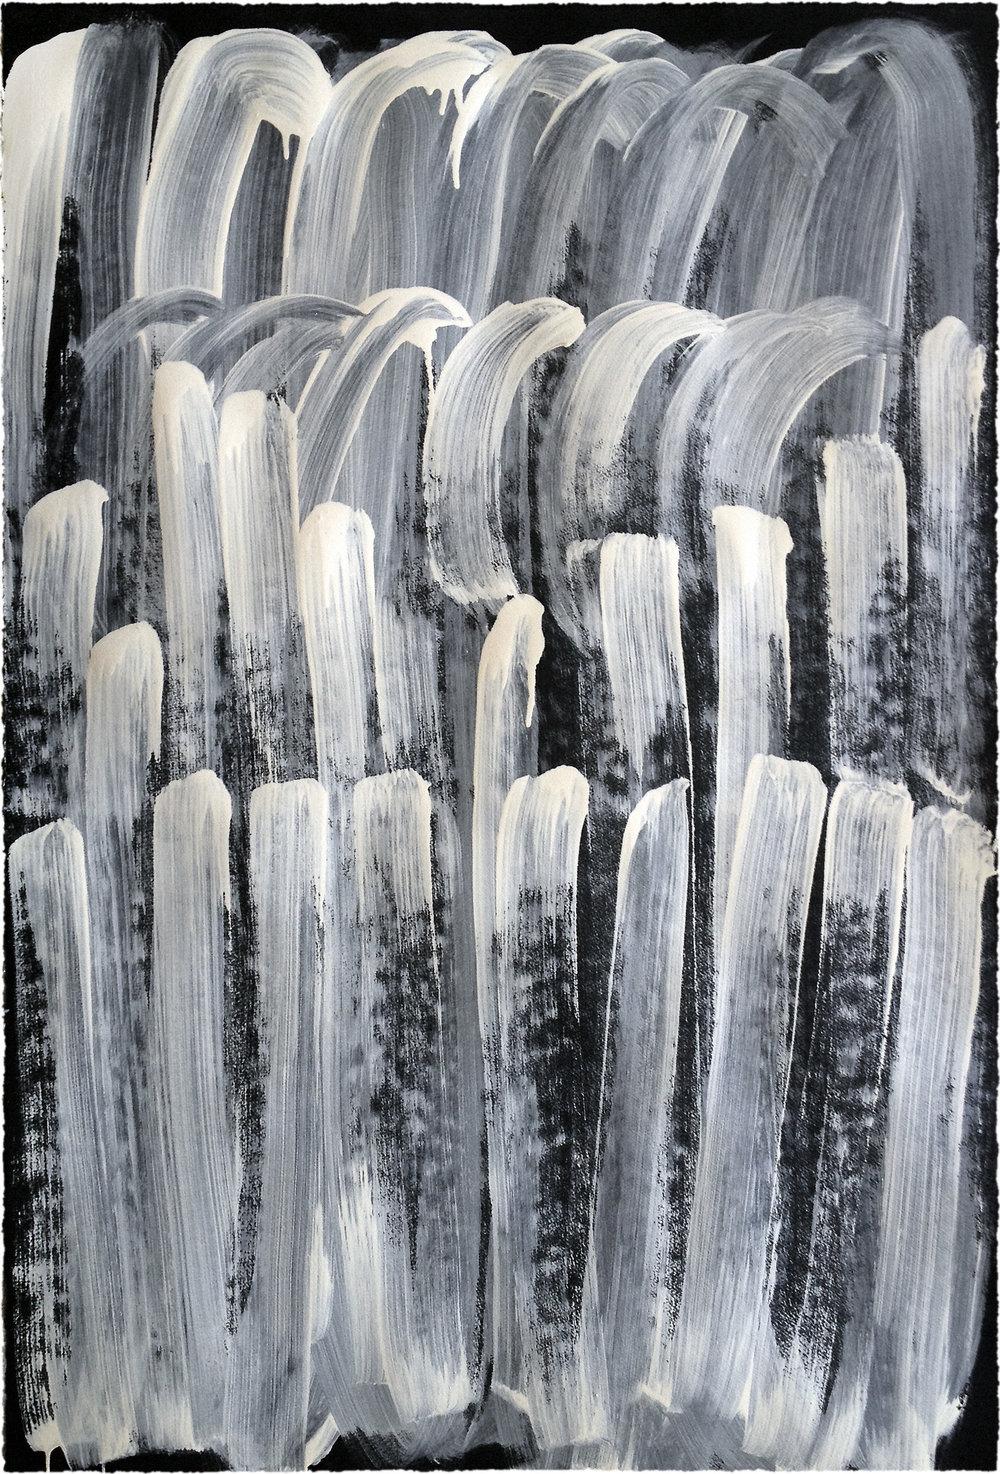 Líneas Blancas — Diego Berjon